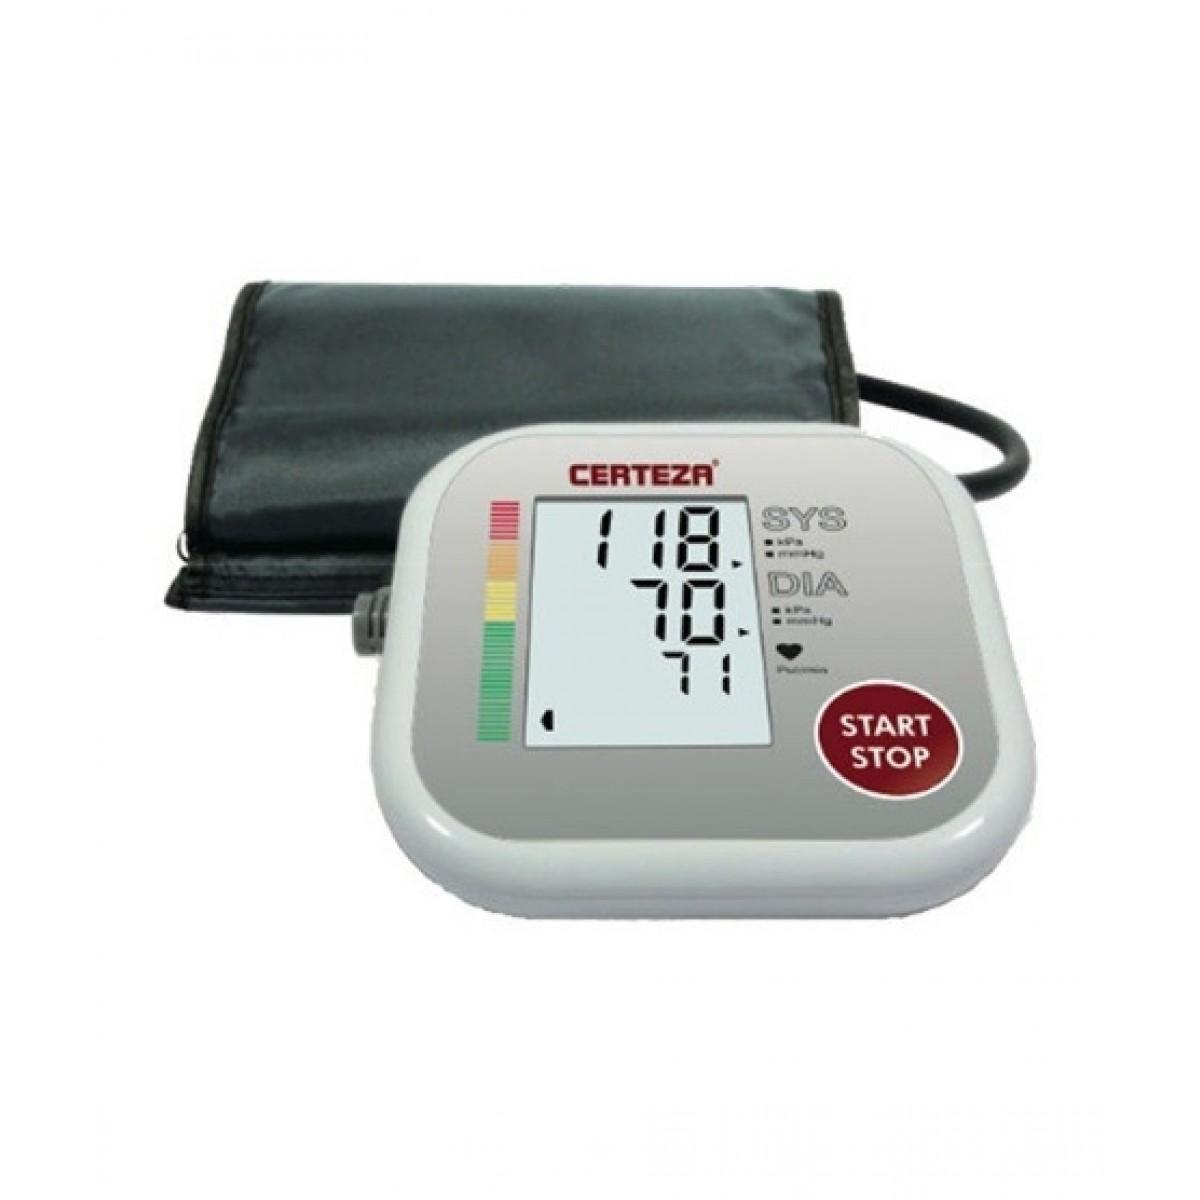 Certeza Upper Arm Digital Blood Pressure Monitor With Adapter (BM-405AD)